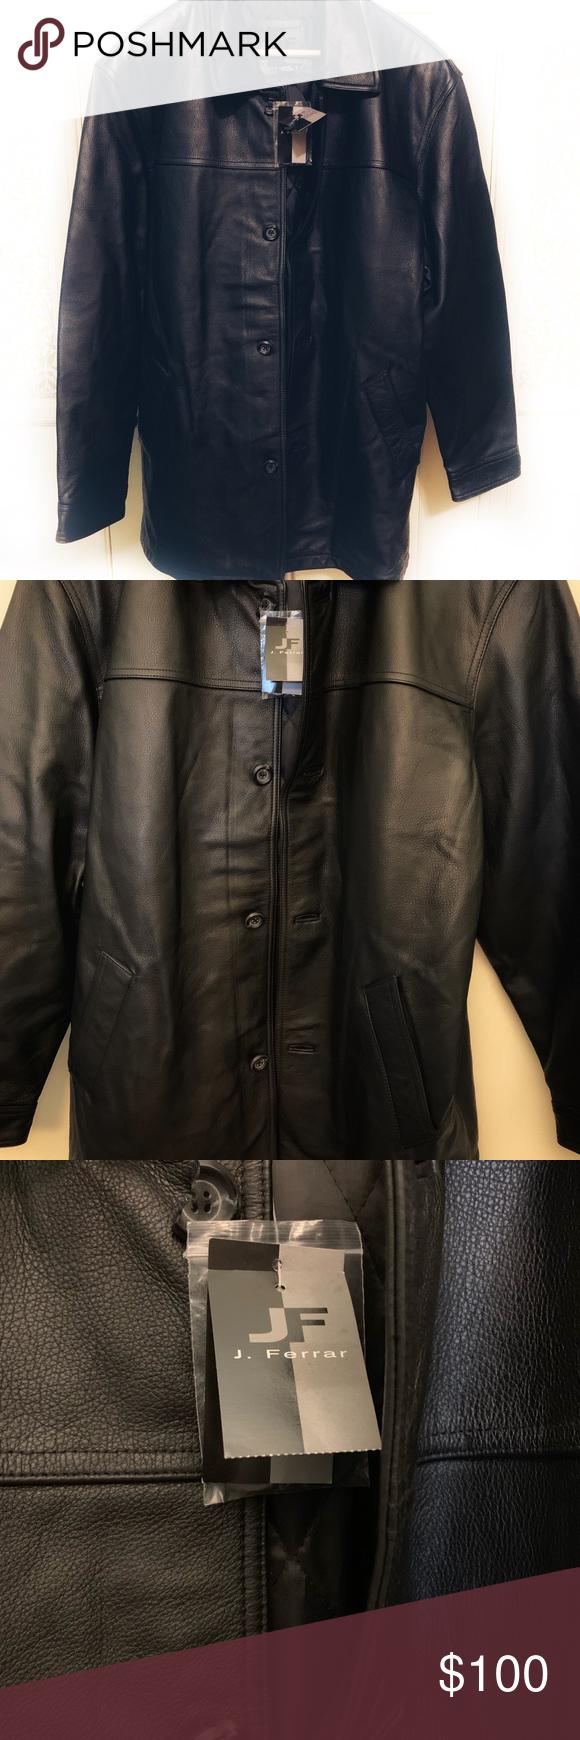 Jj Ferrar Men S Leather Jacket Leather Jacket Jackets Leather